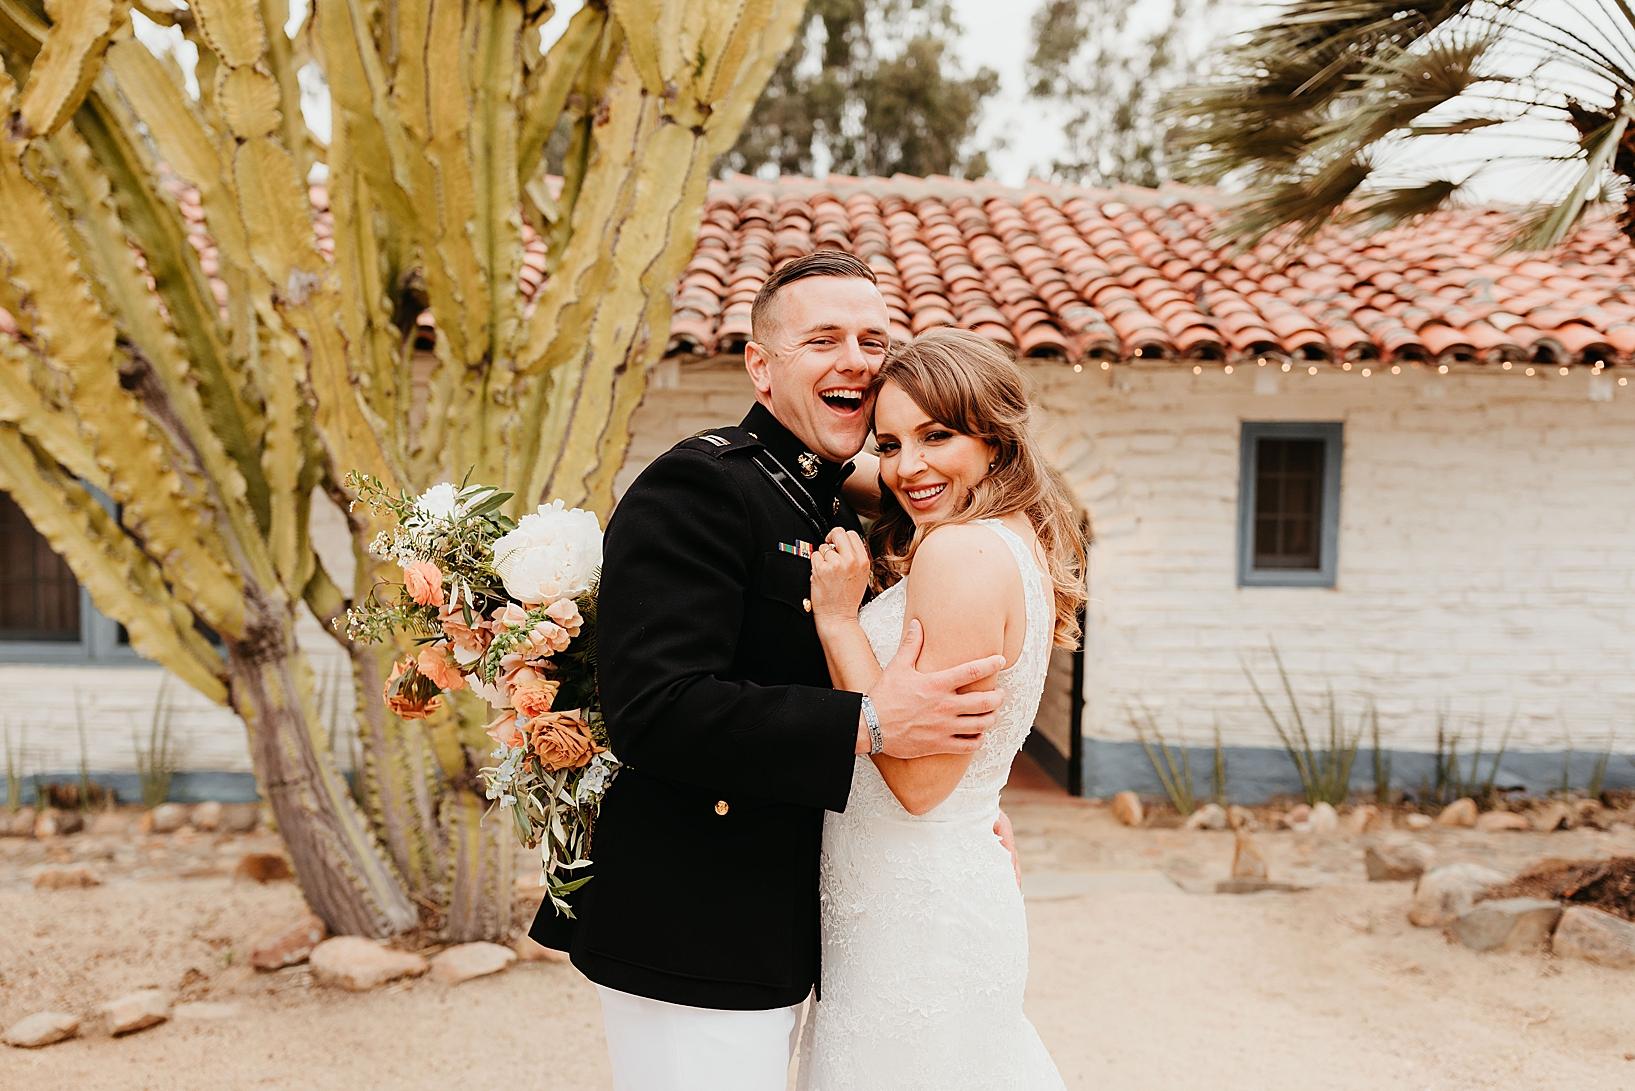 Leo-Carrillo-Ranch-Wedding-96.jpg